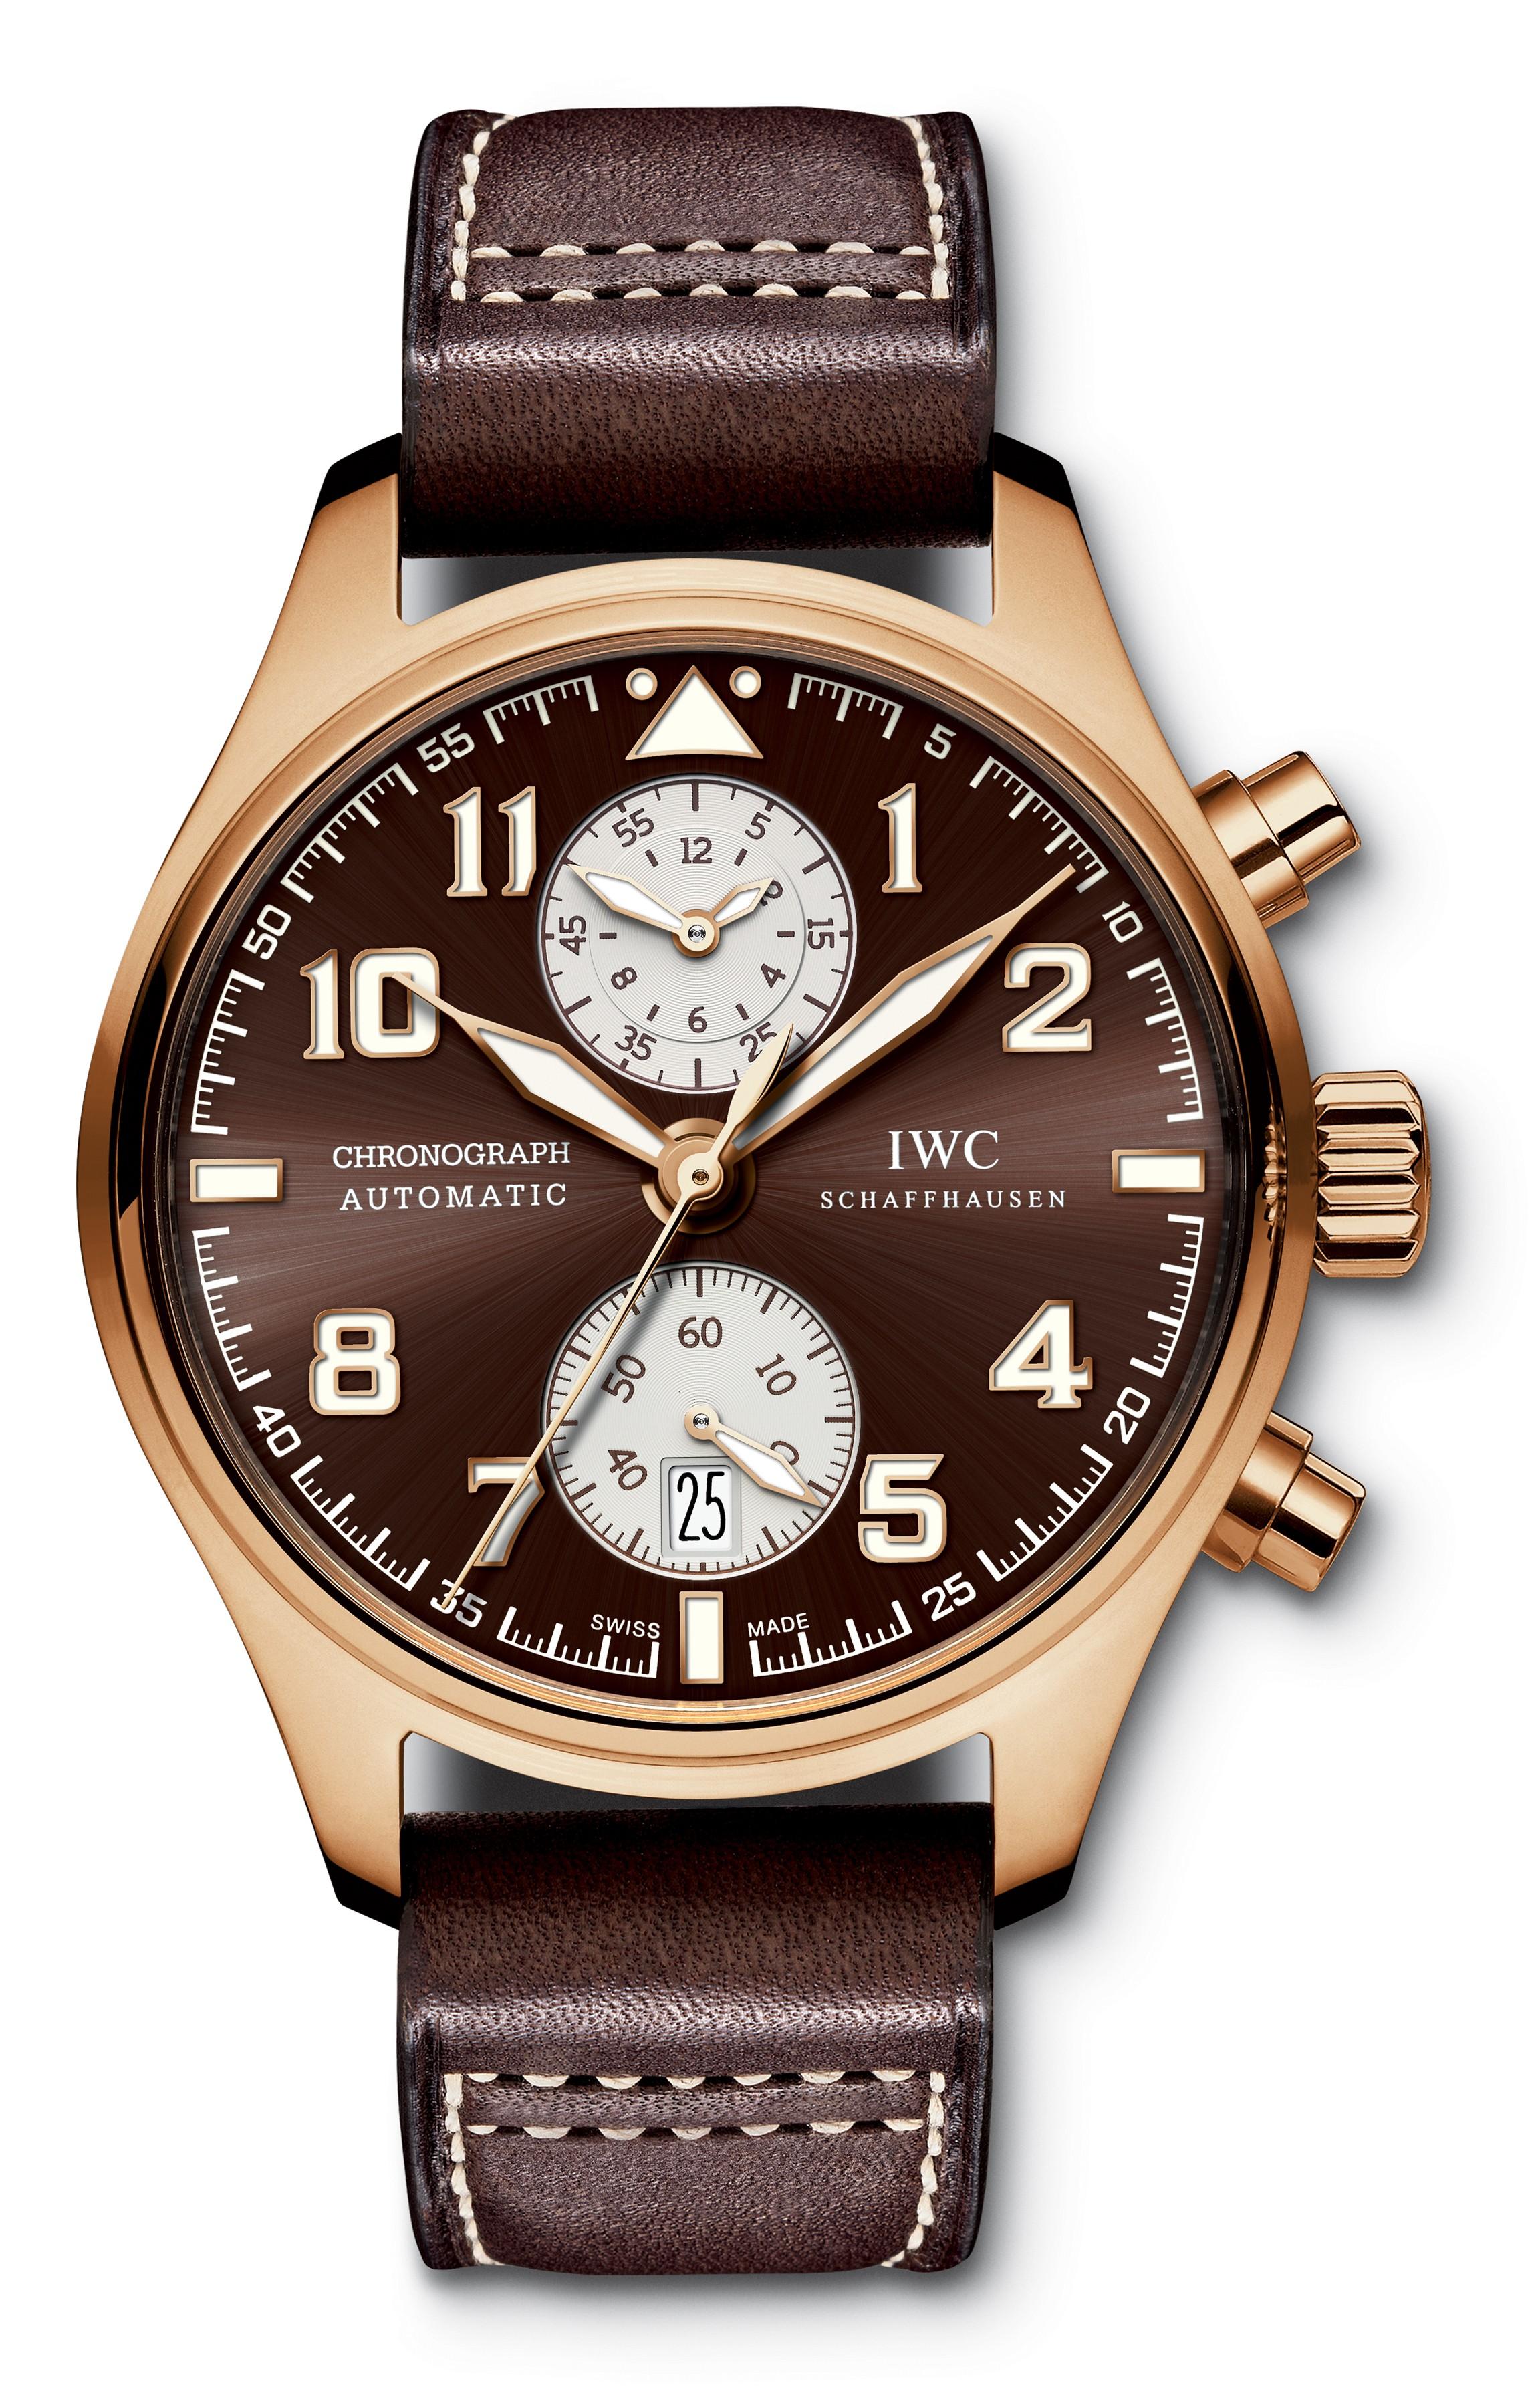 IWC Pilots Chronograph Edition Antoine de Saint Exupery 18k Rose Gold Men's Watch (MSRP $34,500) - on sale for $16,495 after coupon